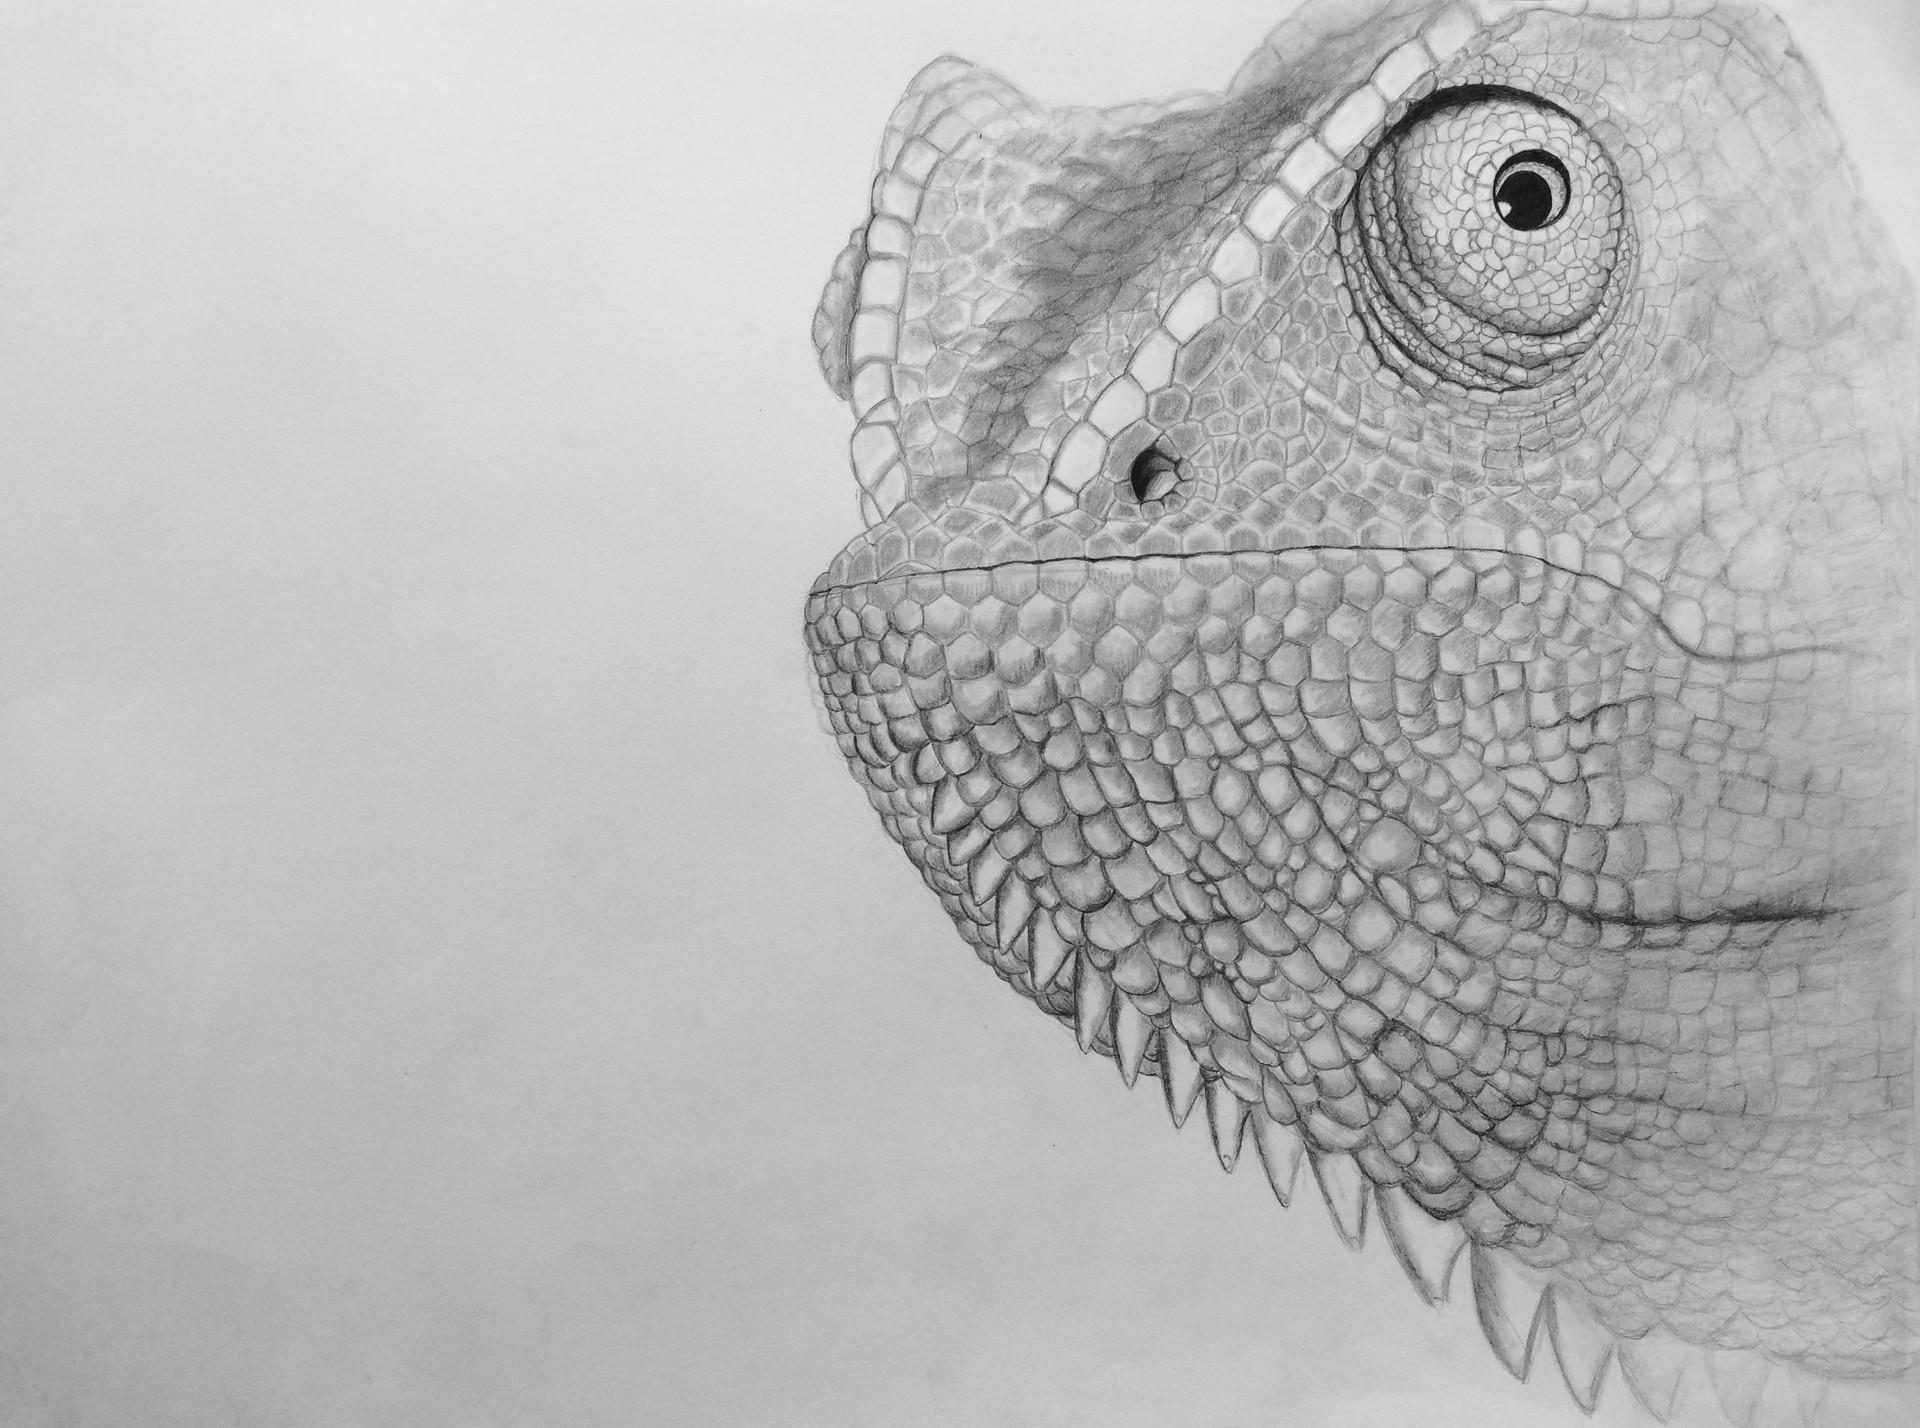 The Colorblind Chameleon